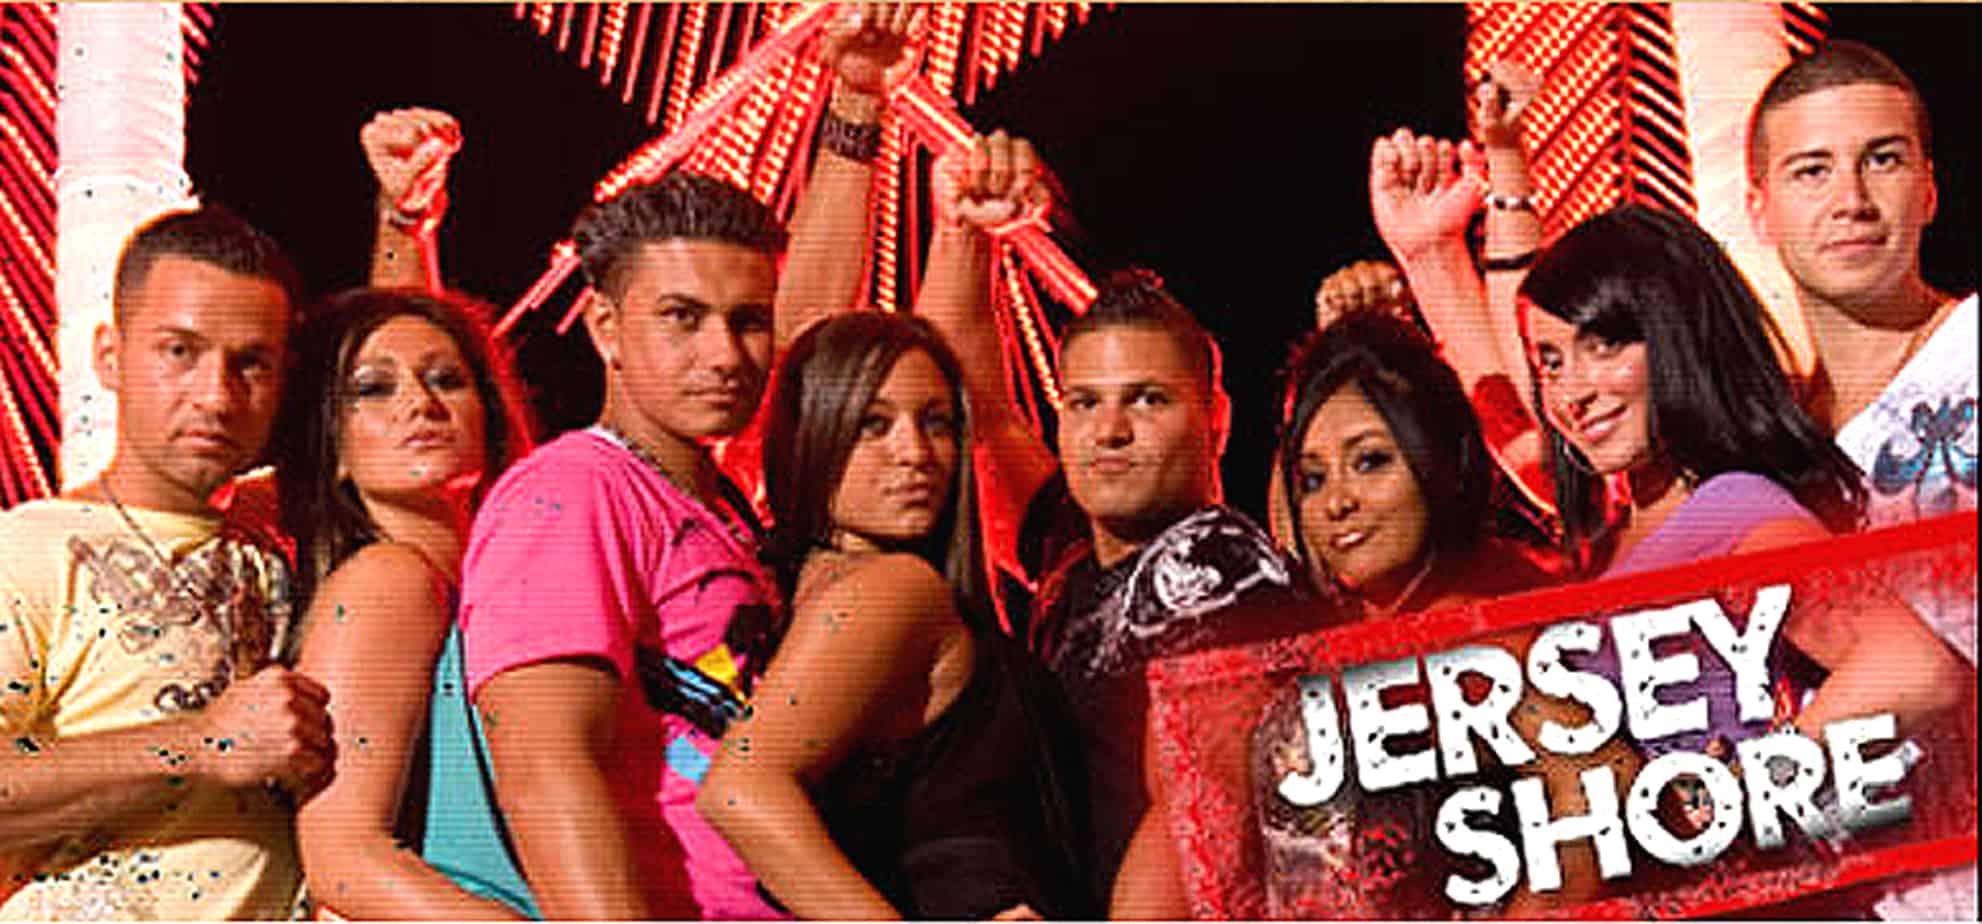 Jersey Shore – MTV